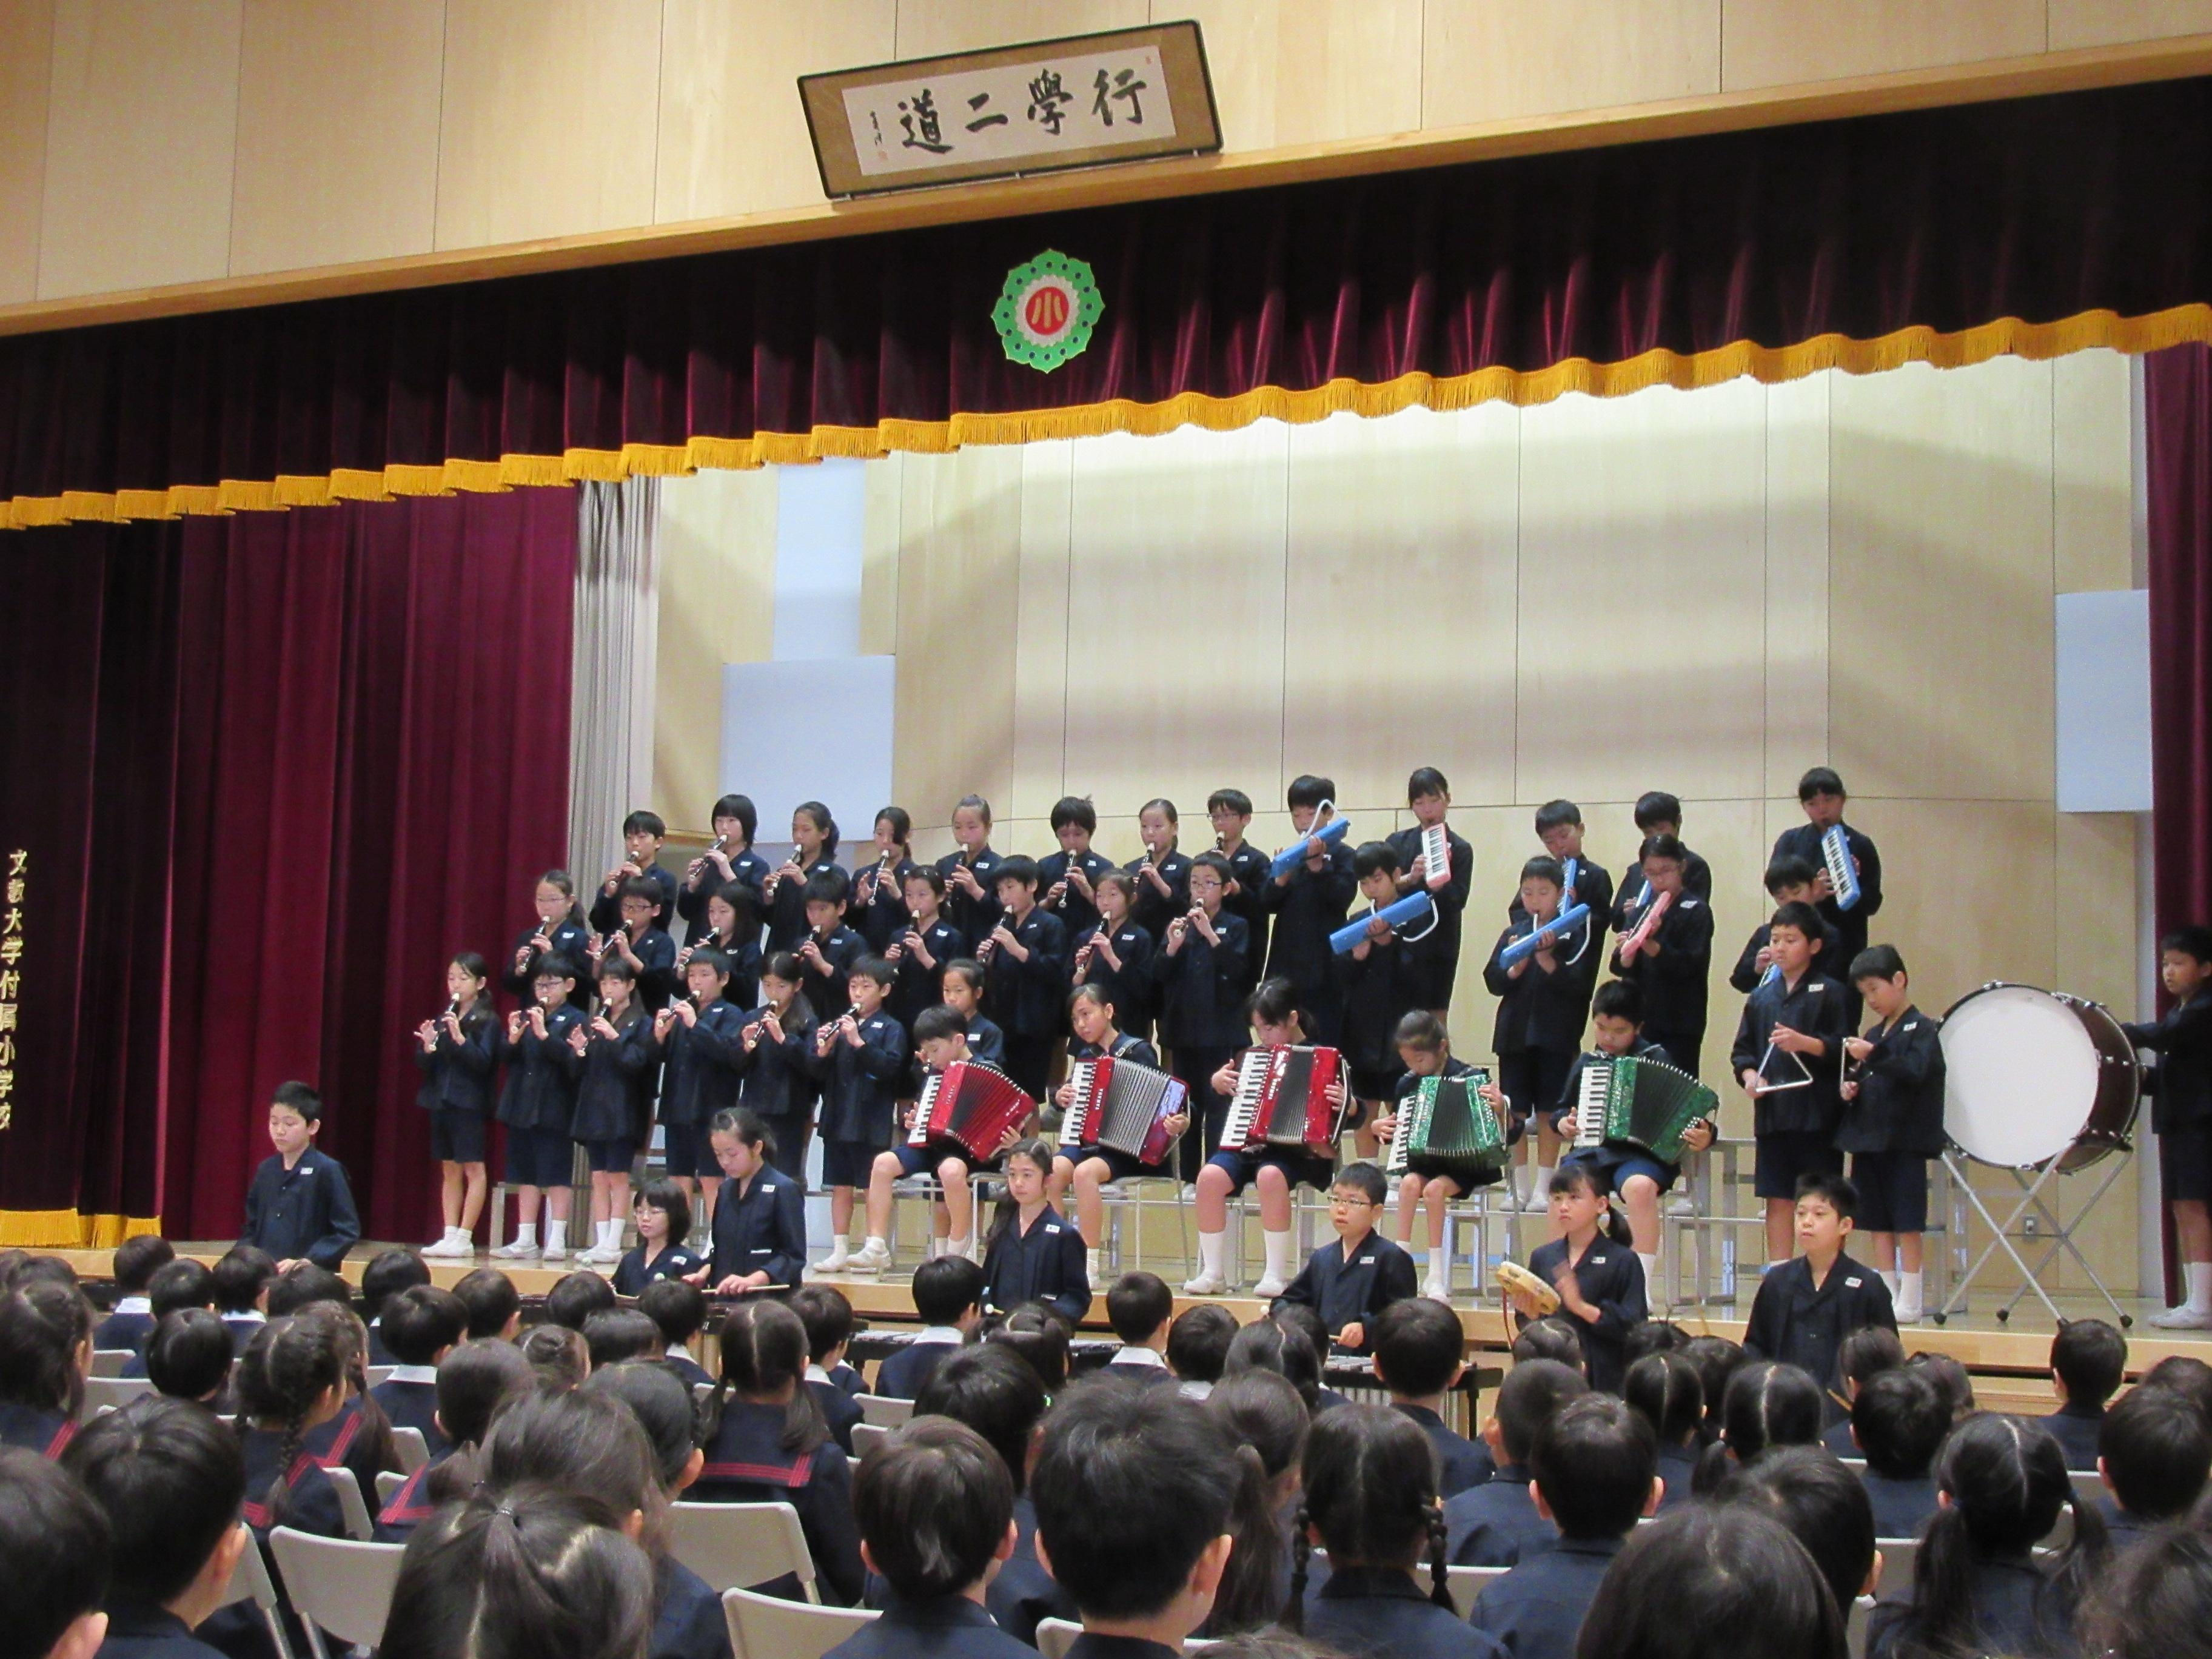 H30 1年生歓迎会サブ4.JPG